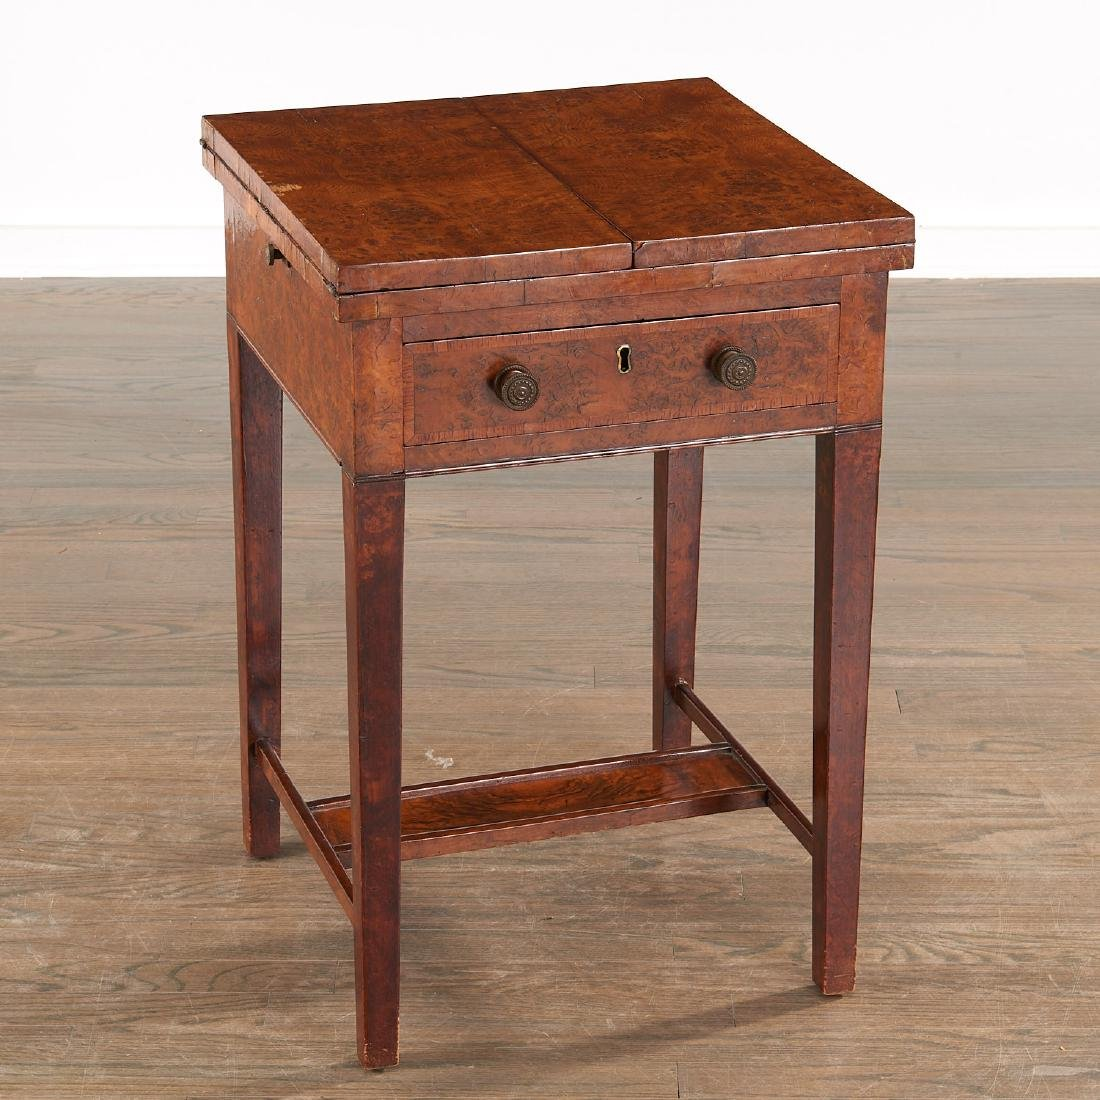 Antique Hepplewhite writing table - 2